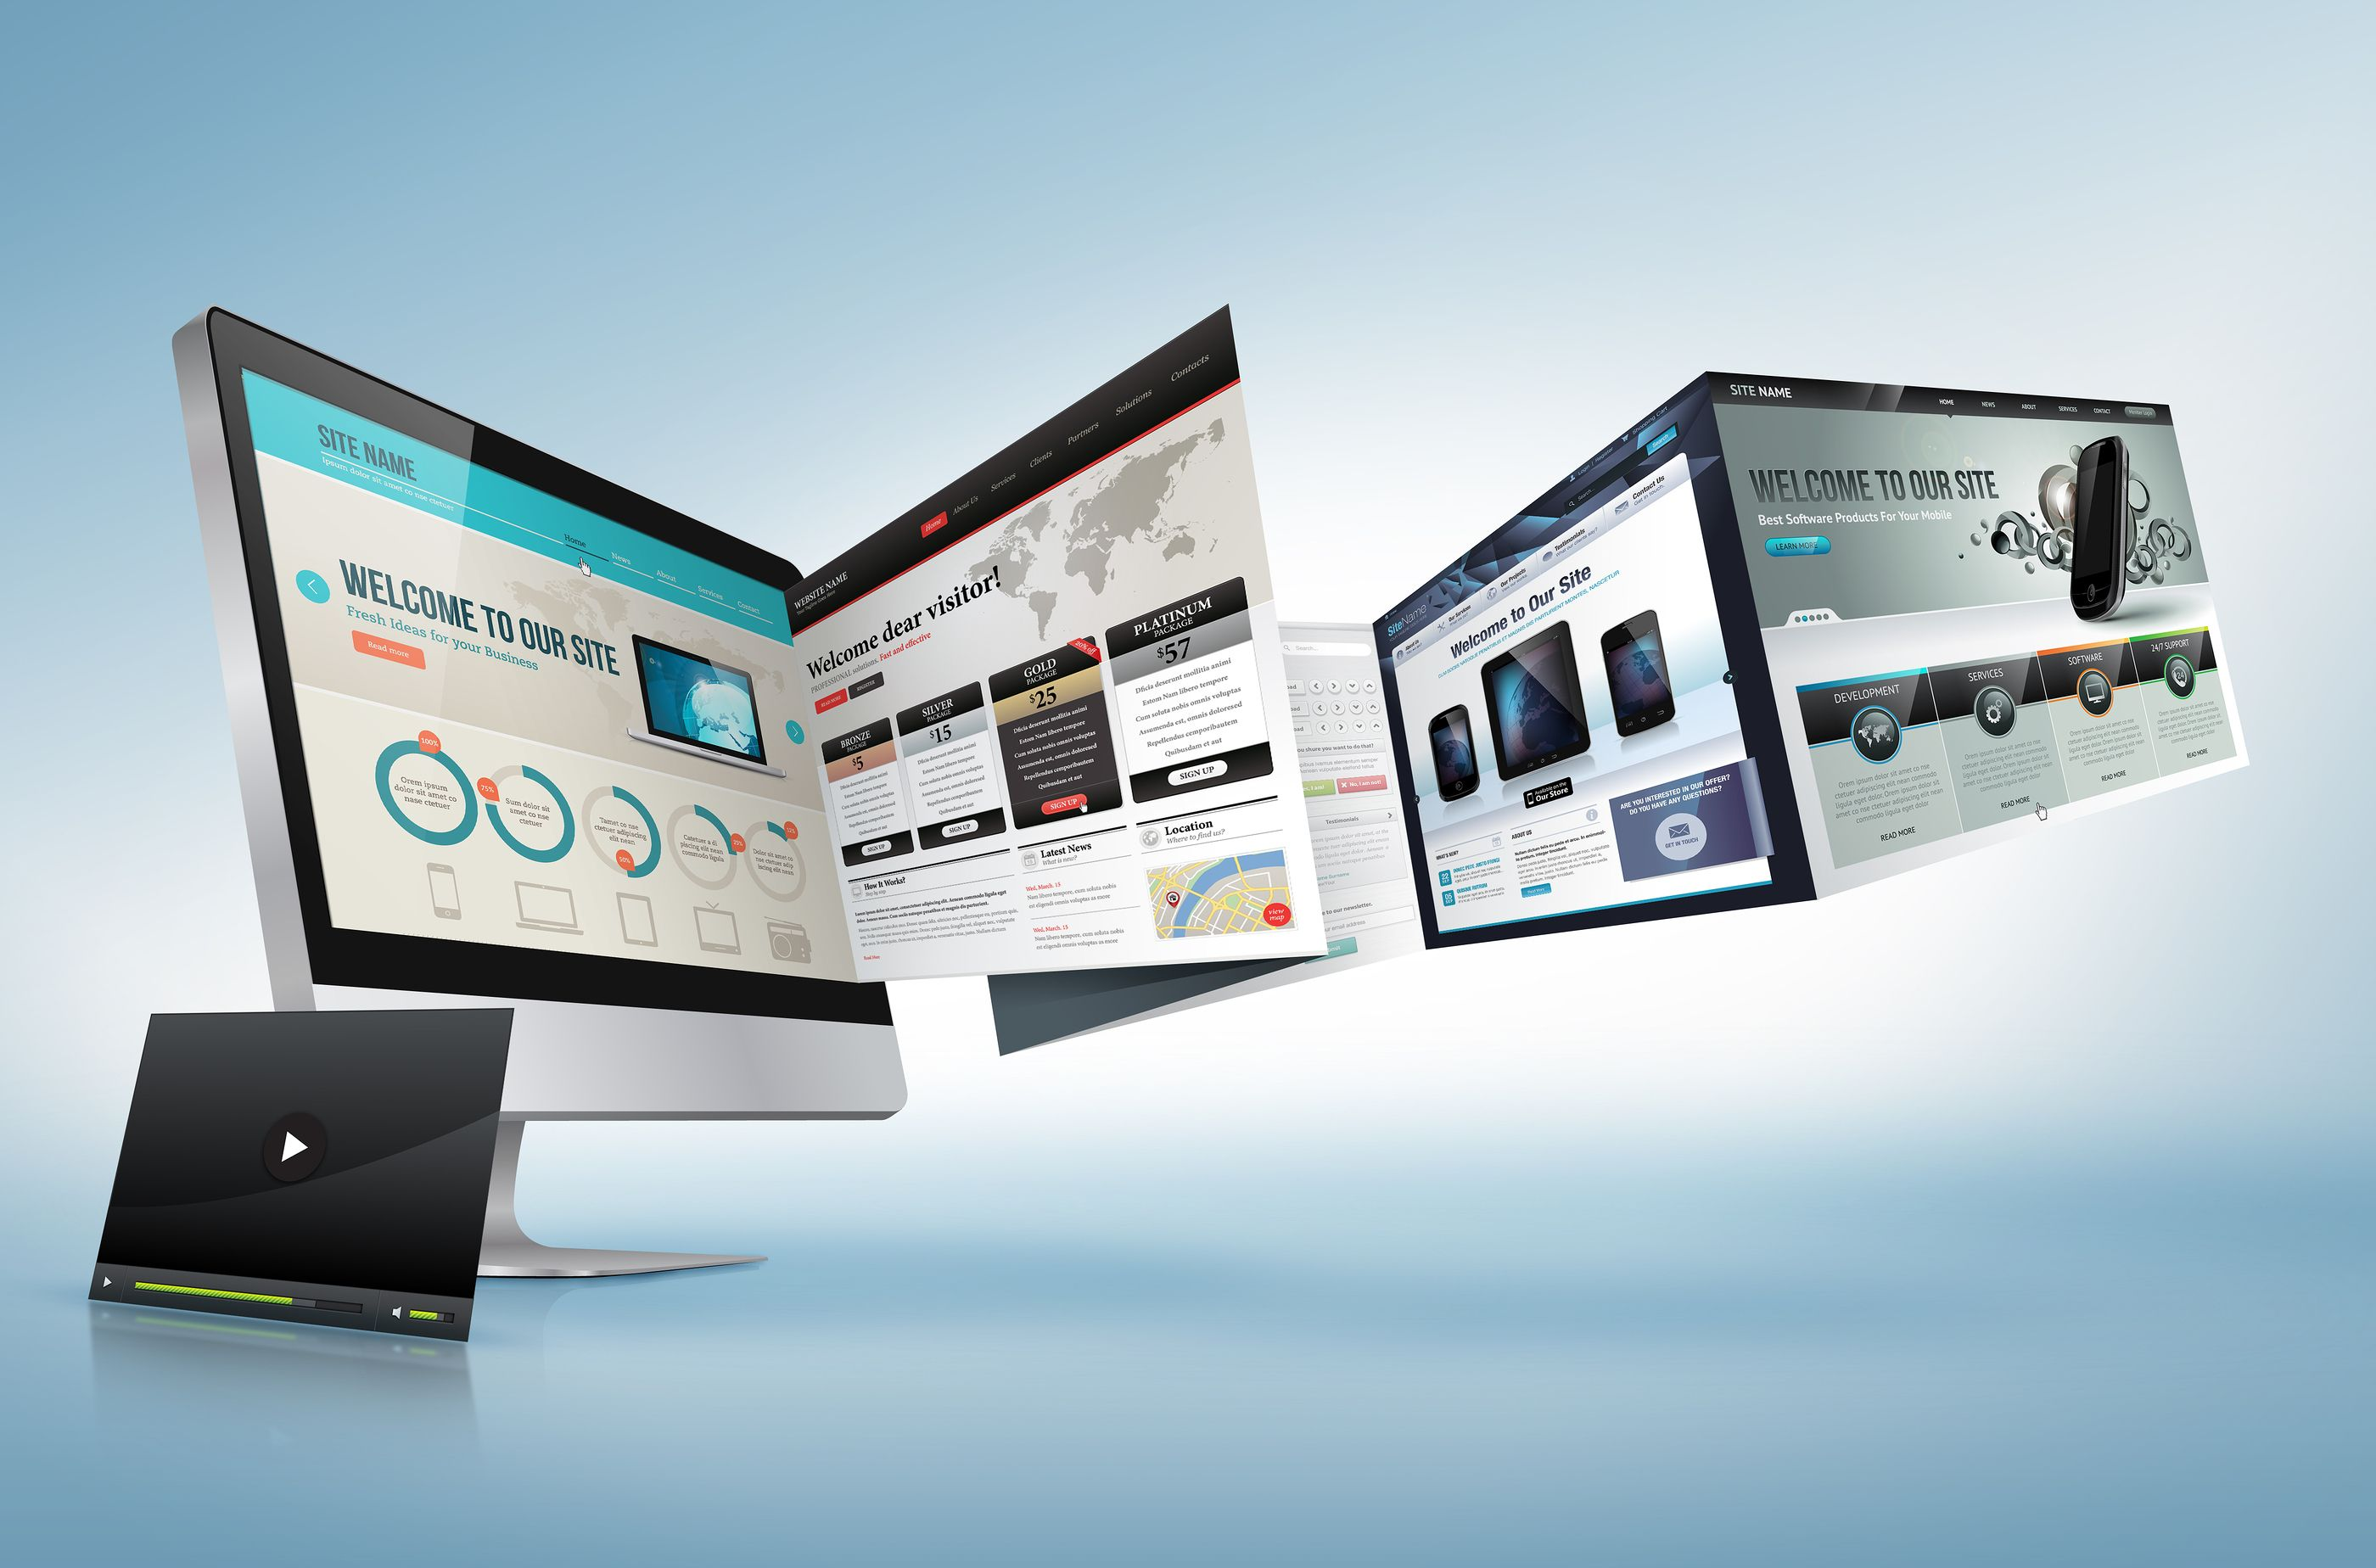 Web Design Inspiration Gallery Web Design Services Professional Web Design Web Design Company